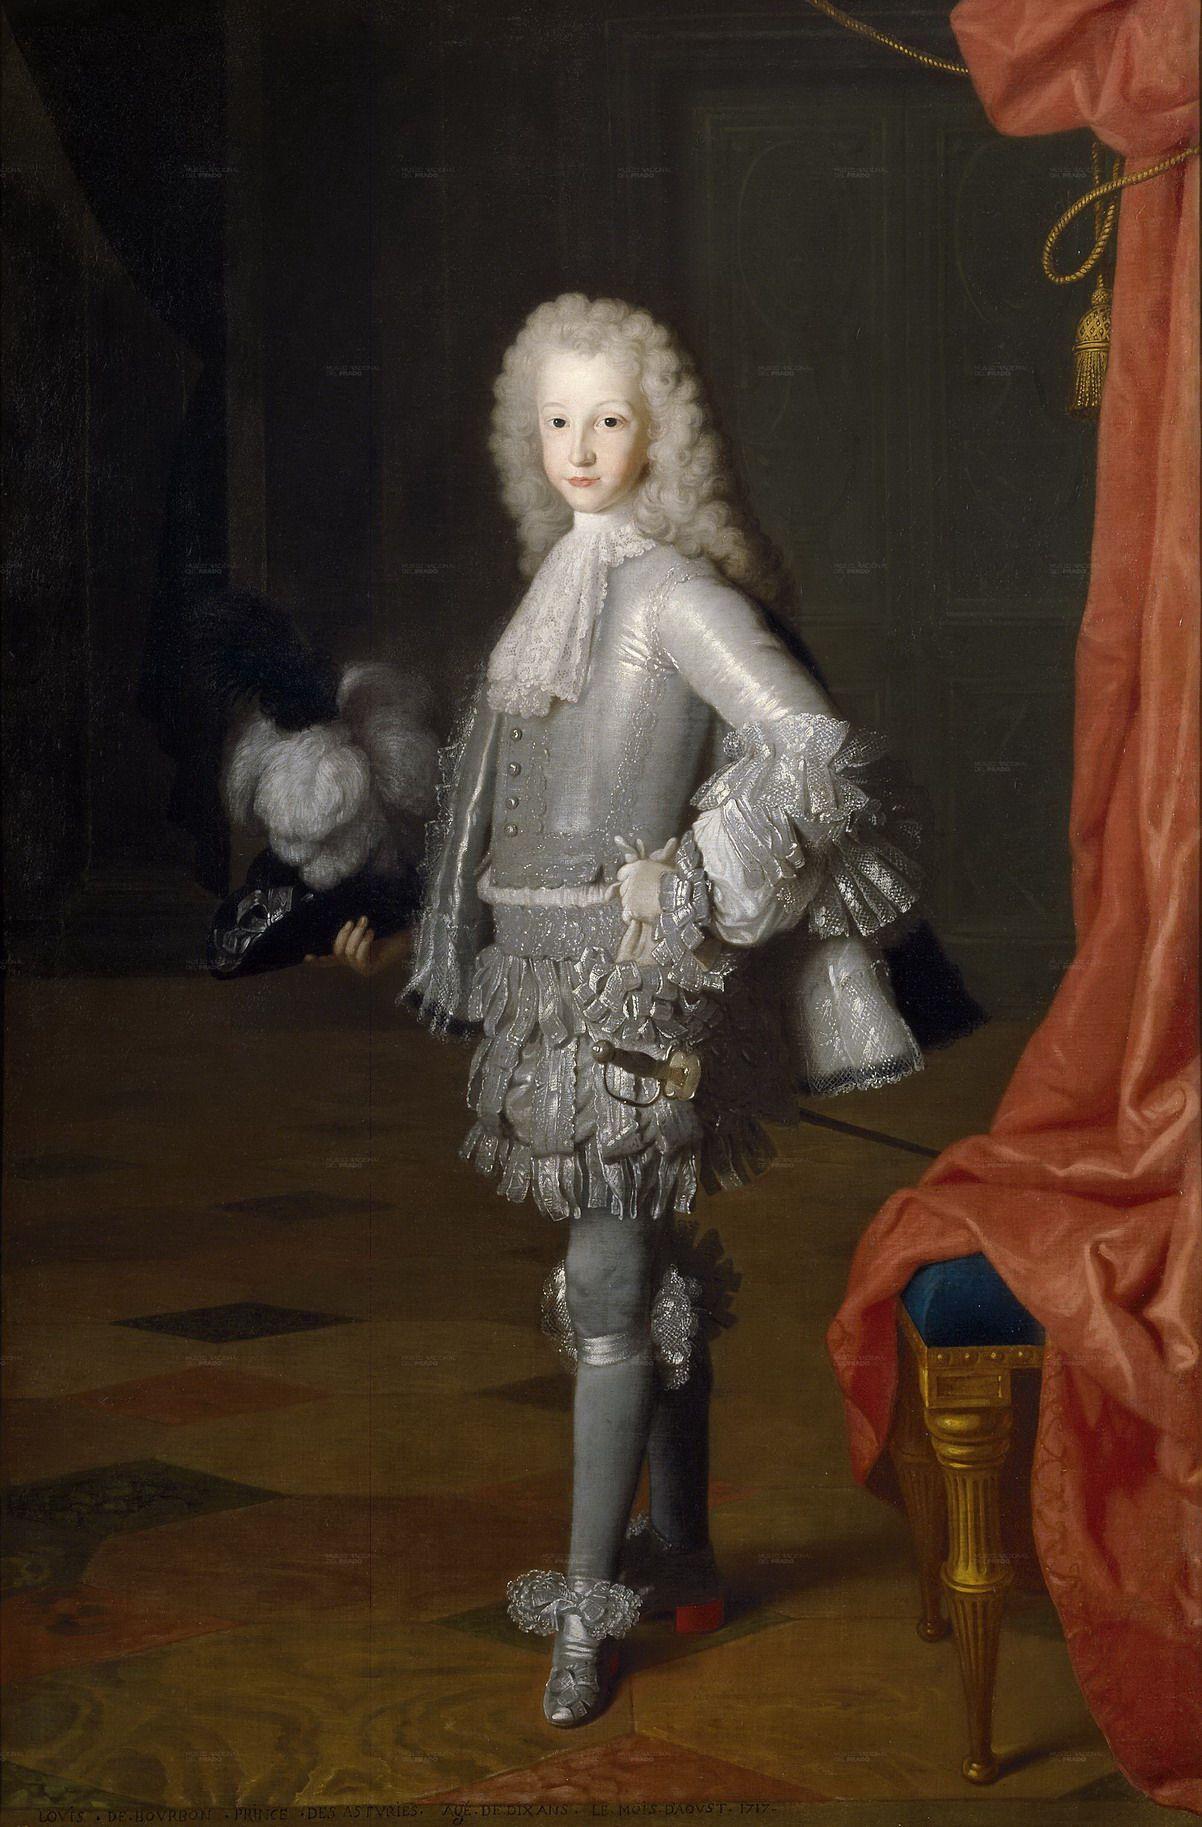 Уассе Мишель-Анж. Луис первый принц Астурийский http://www.art.alebor.ru/pictur.php?pic=1700/1717_Uasse_Miwel4-Anj._Luis_perv3y_princ_Asturiyskiy%281202x1827%29.jpg&uv=0